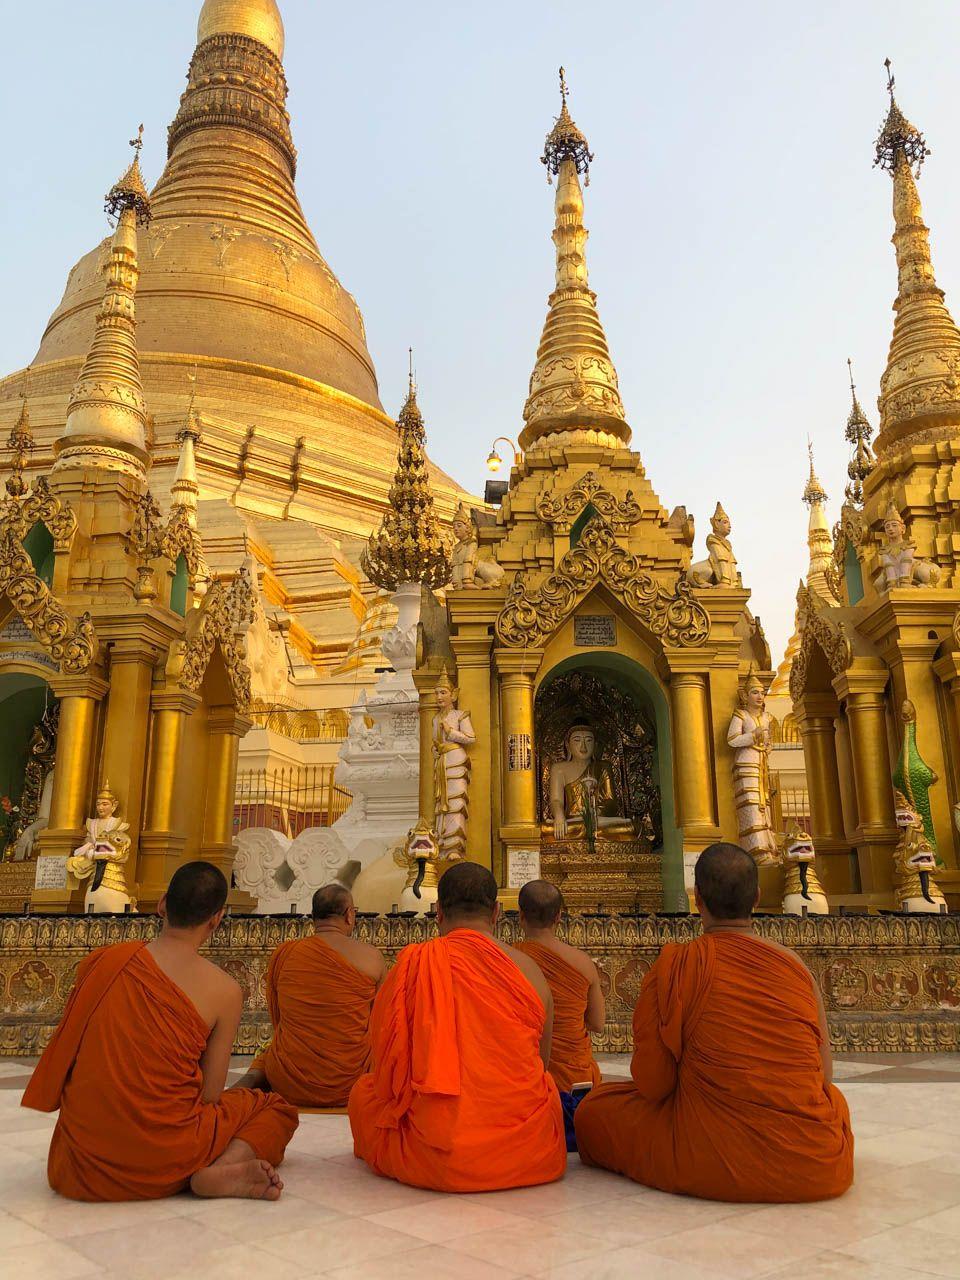 Monks at Shwedagon Pagoda in Yangon, Myanmar.